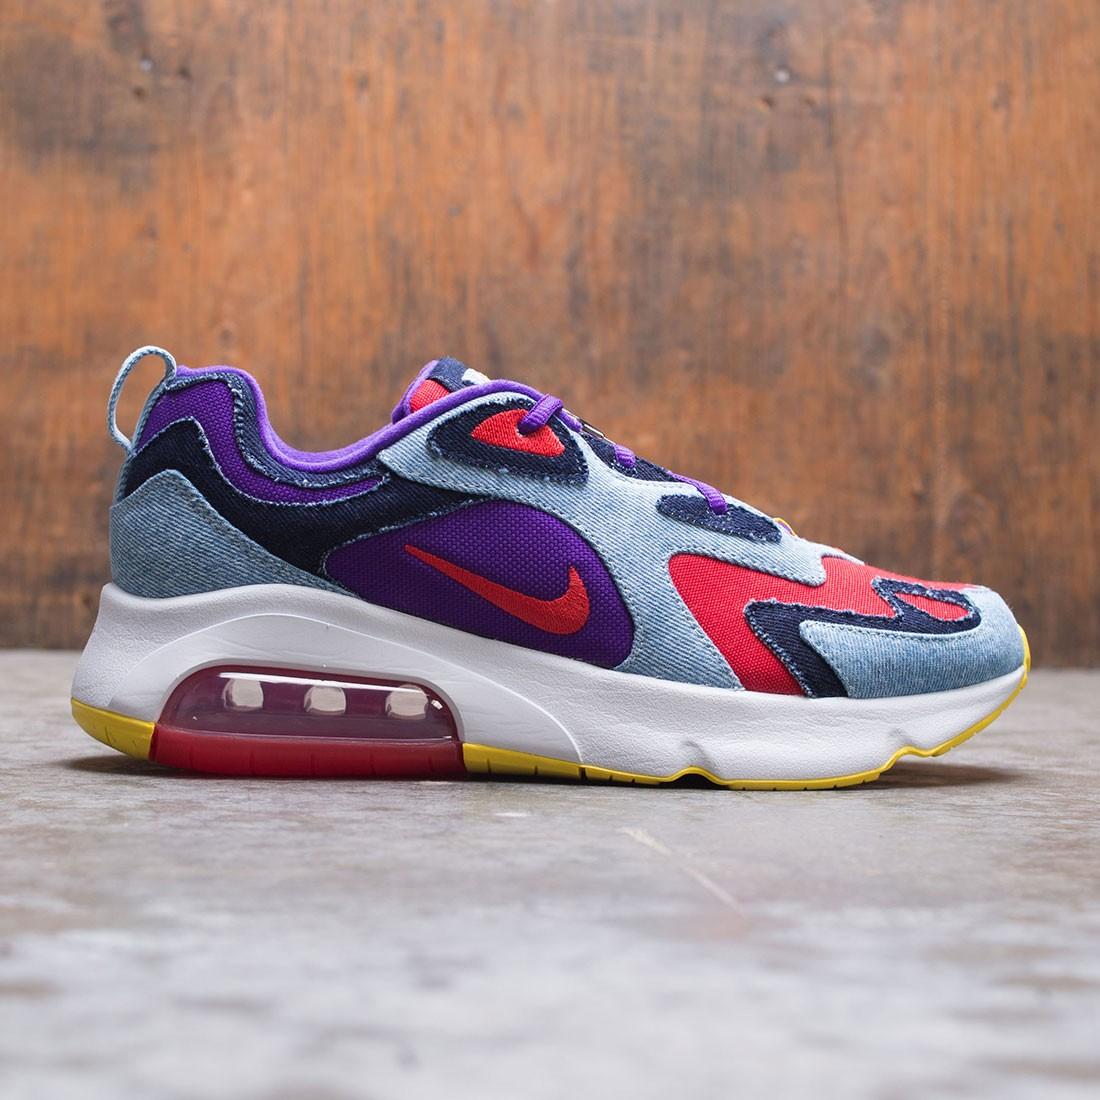 Nike Men Air Max 200 Sp (university red voltage purple)